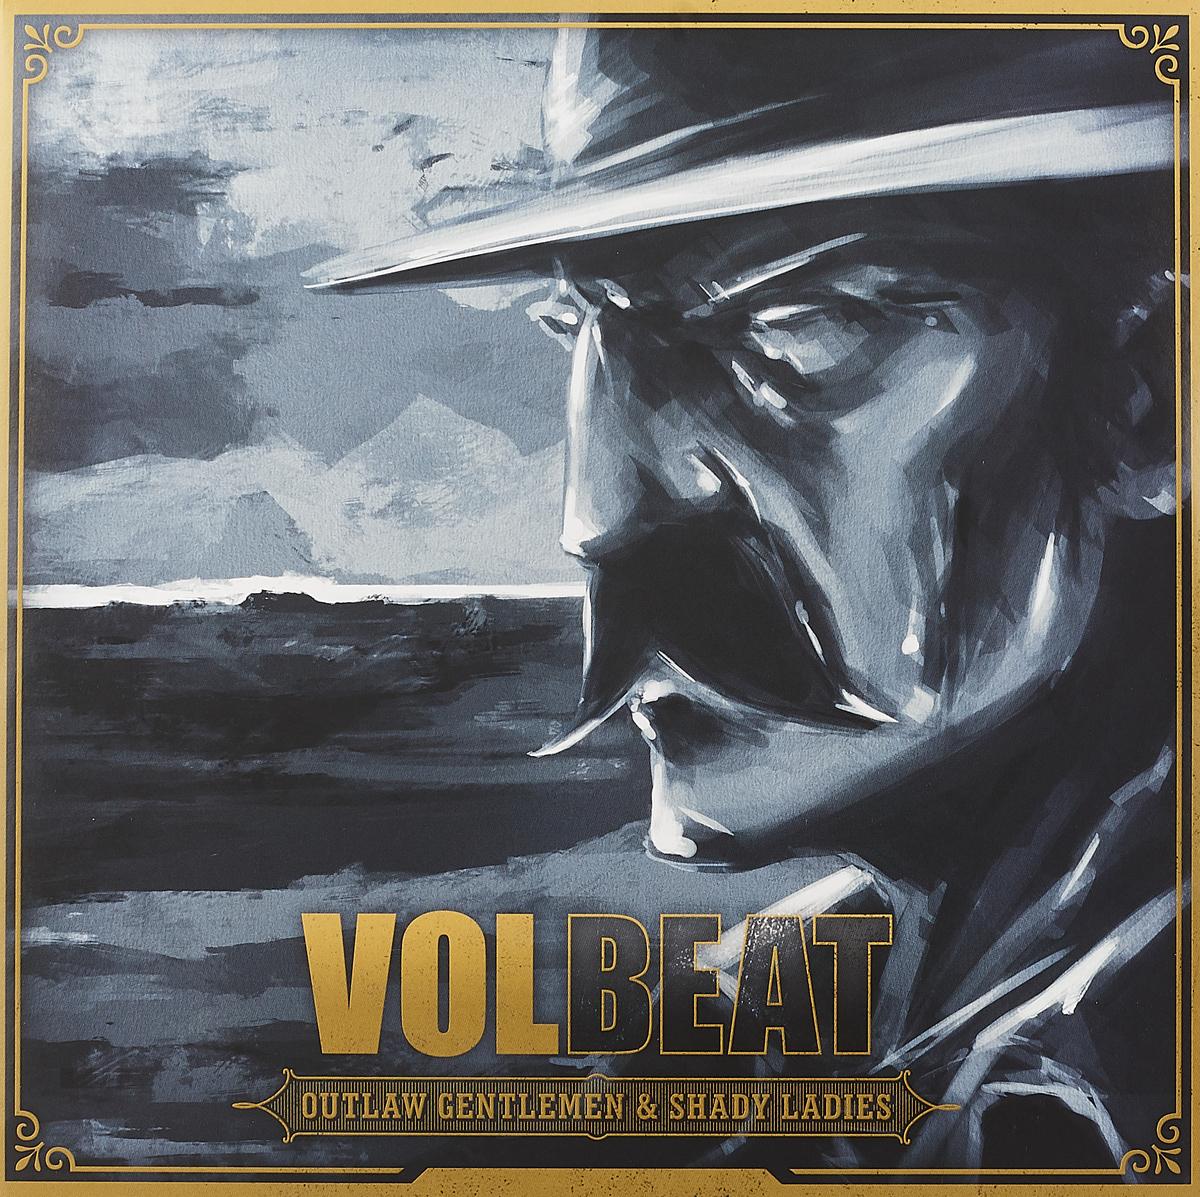 Volbeat Volbeat. Outlaw Gentlemen And Shady Ladies (2 LP + CD) italians gentlemen пиджак